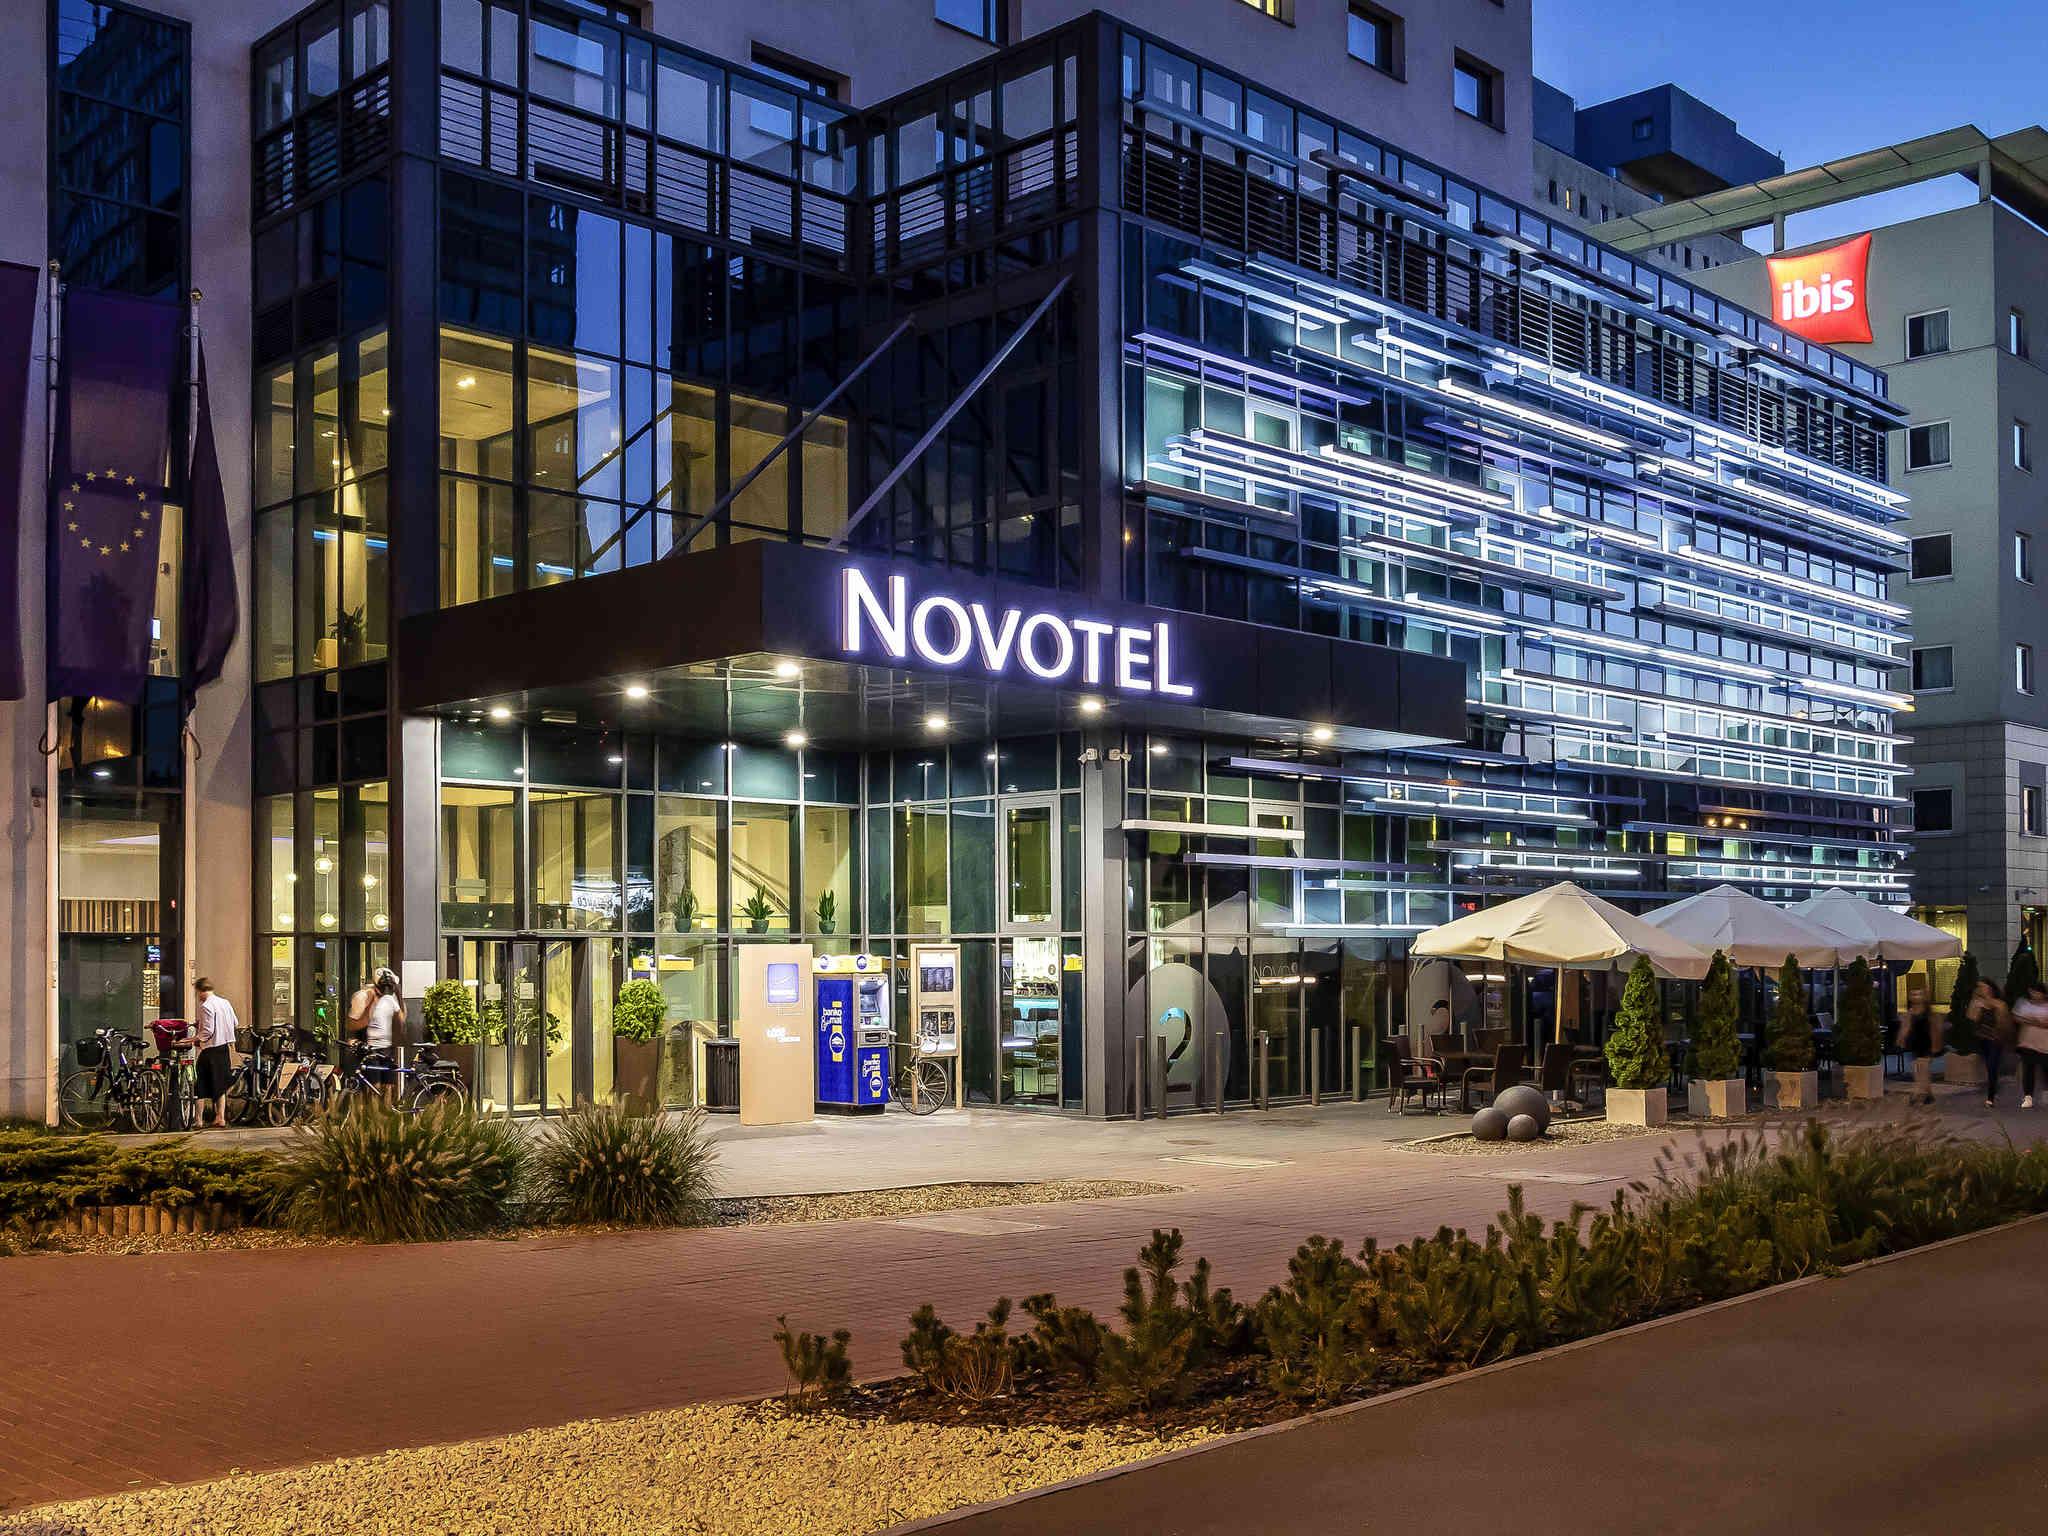 Hôtel - Novotel Lodz Centrum